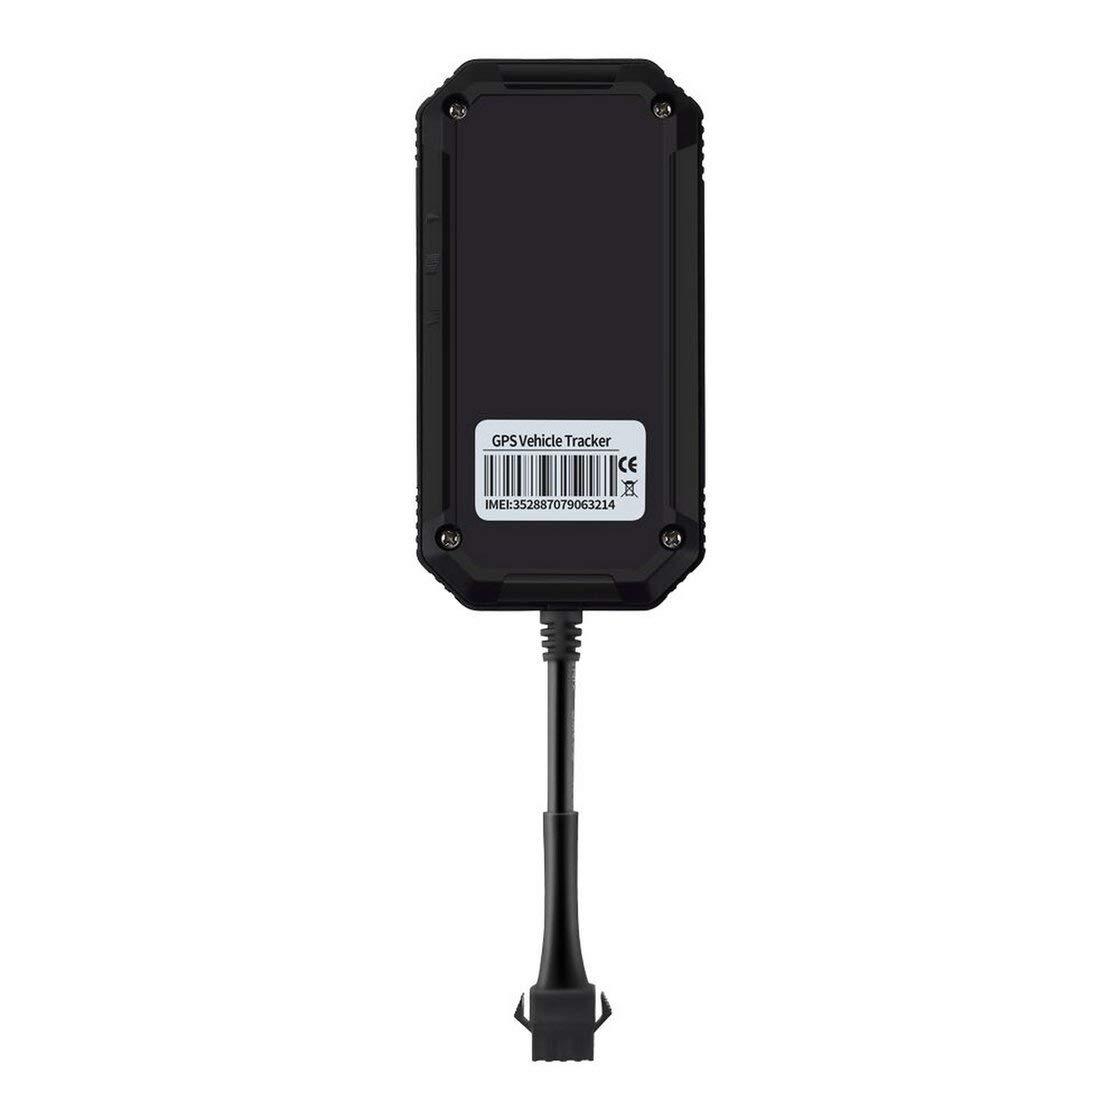 TK300 2G/3G Car/Vehicle/Motorcycle/Truck GPS Tracker Mini GPS Tracker Realtime Tracking Device Locator Vida Solitaria: Amazon.es: Electrónica